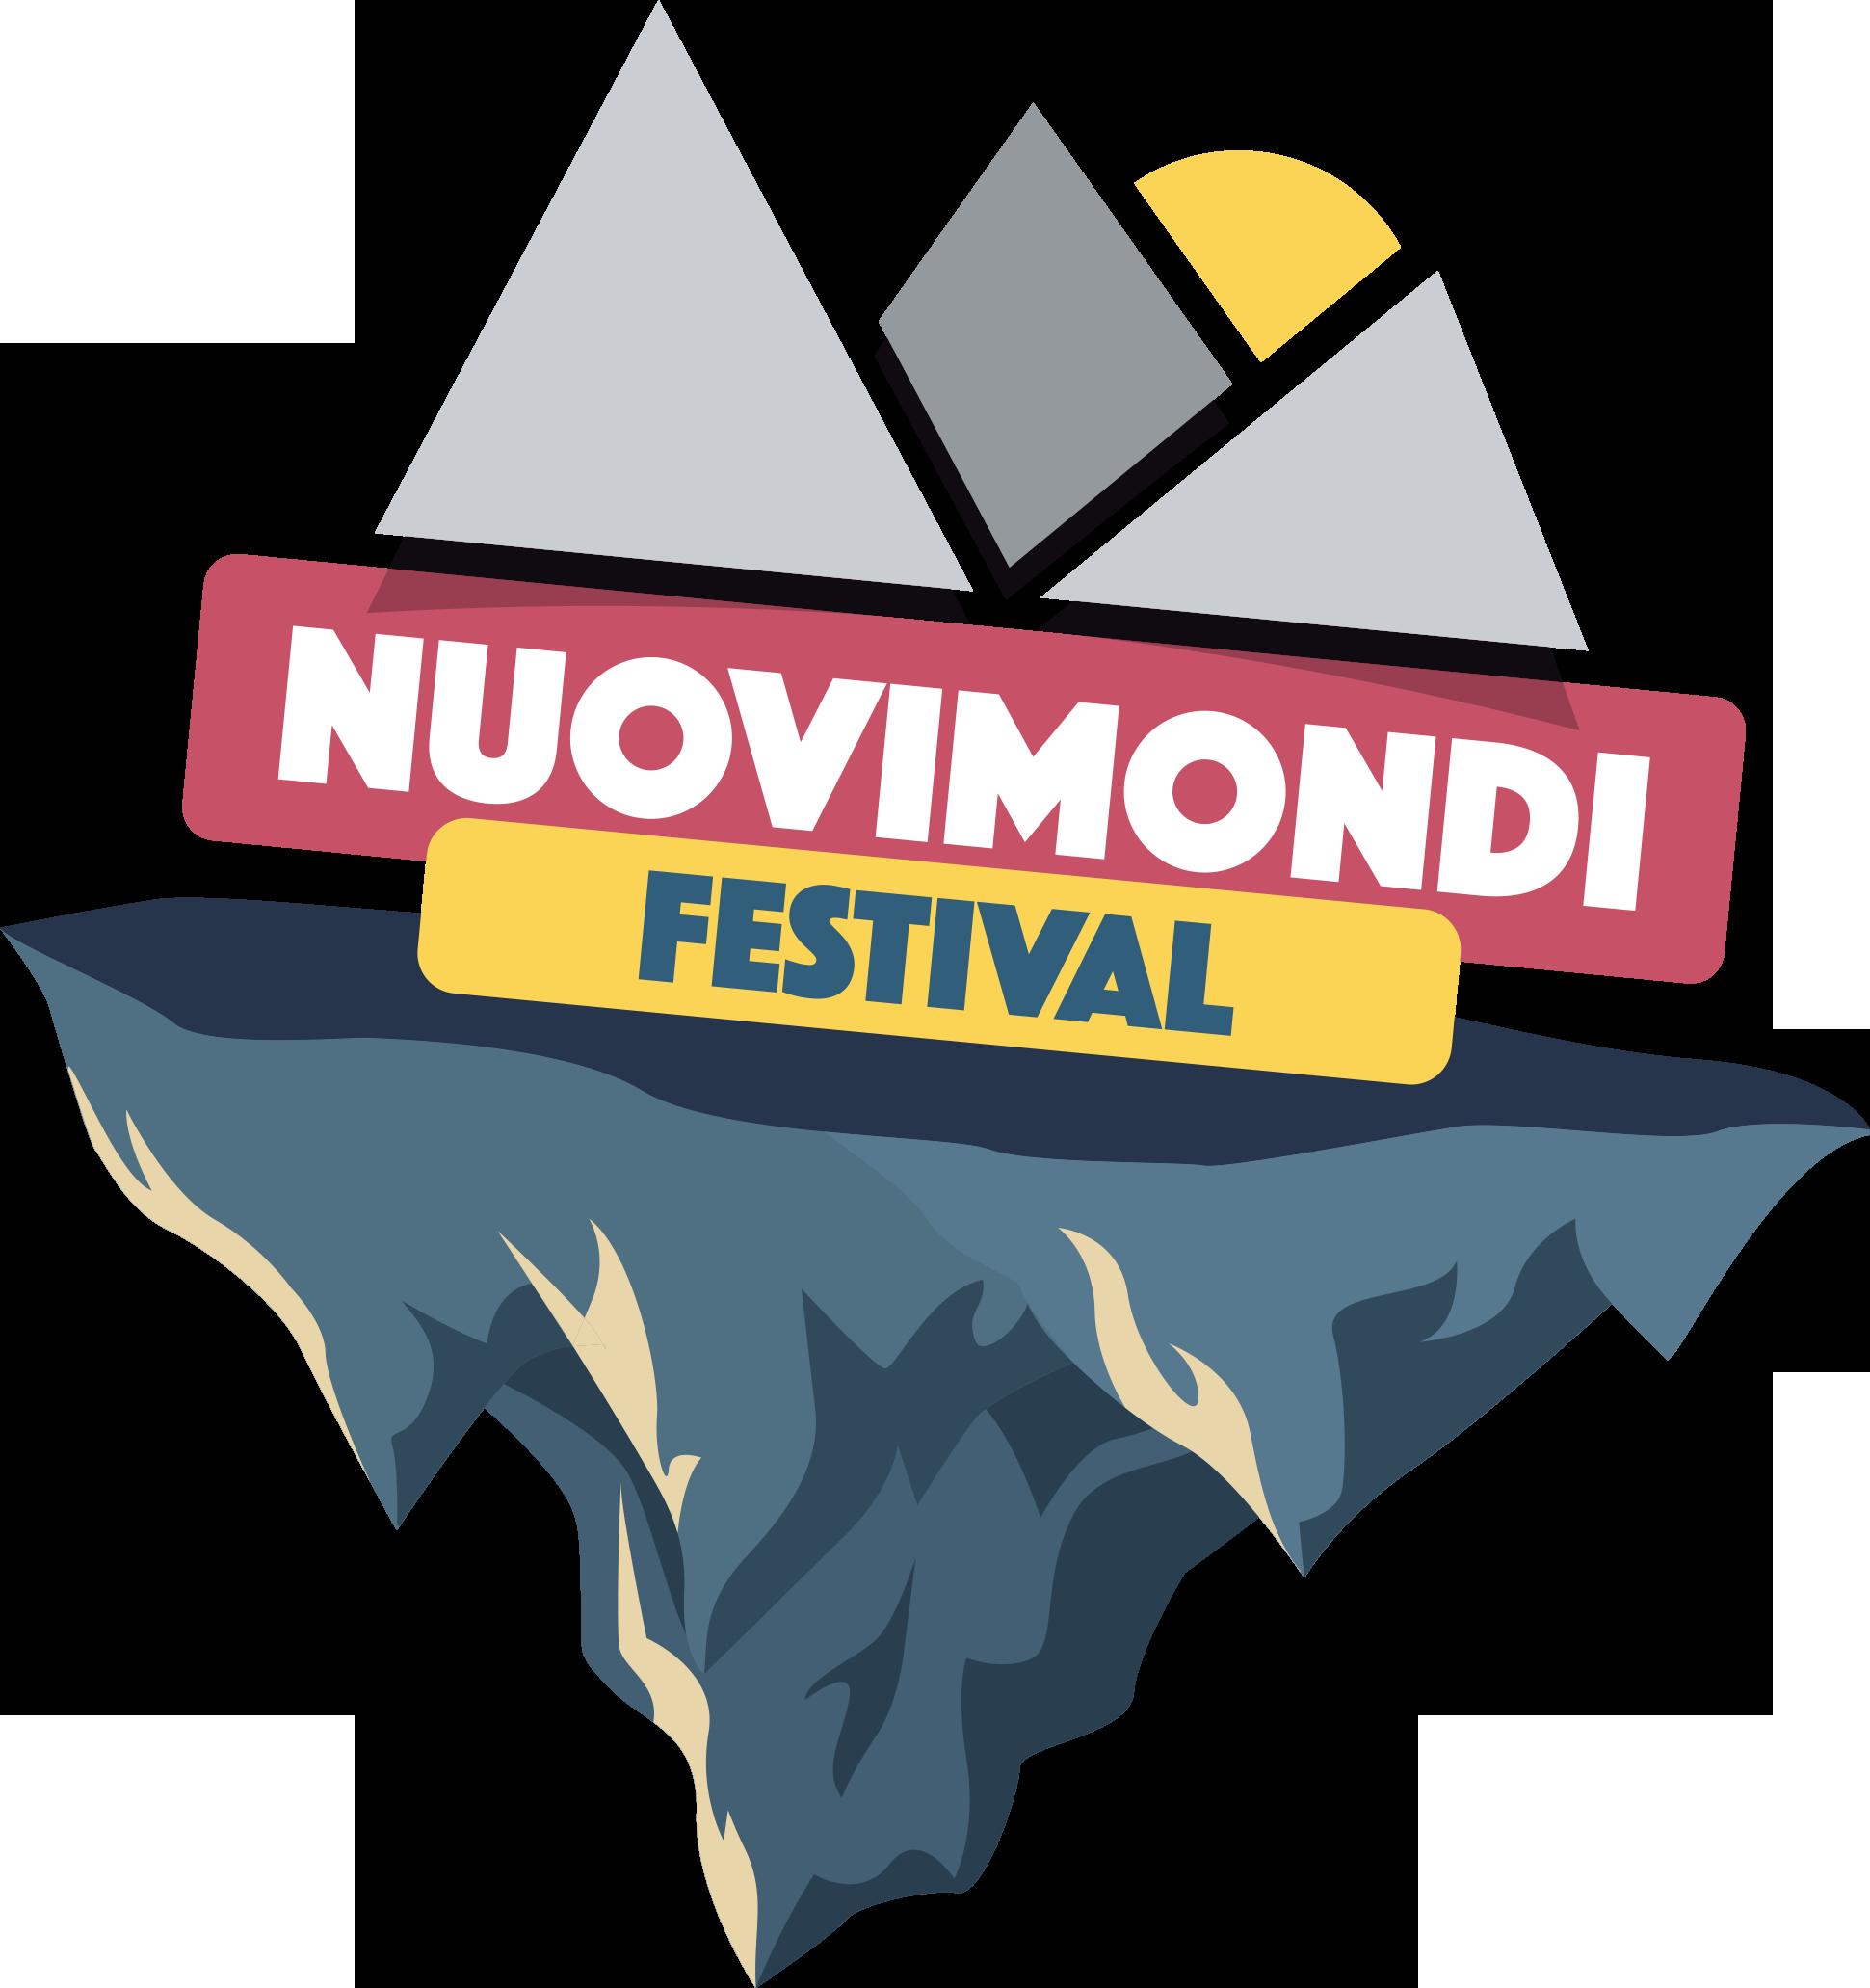 NuoviMondiFestival